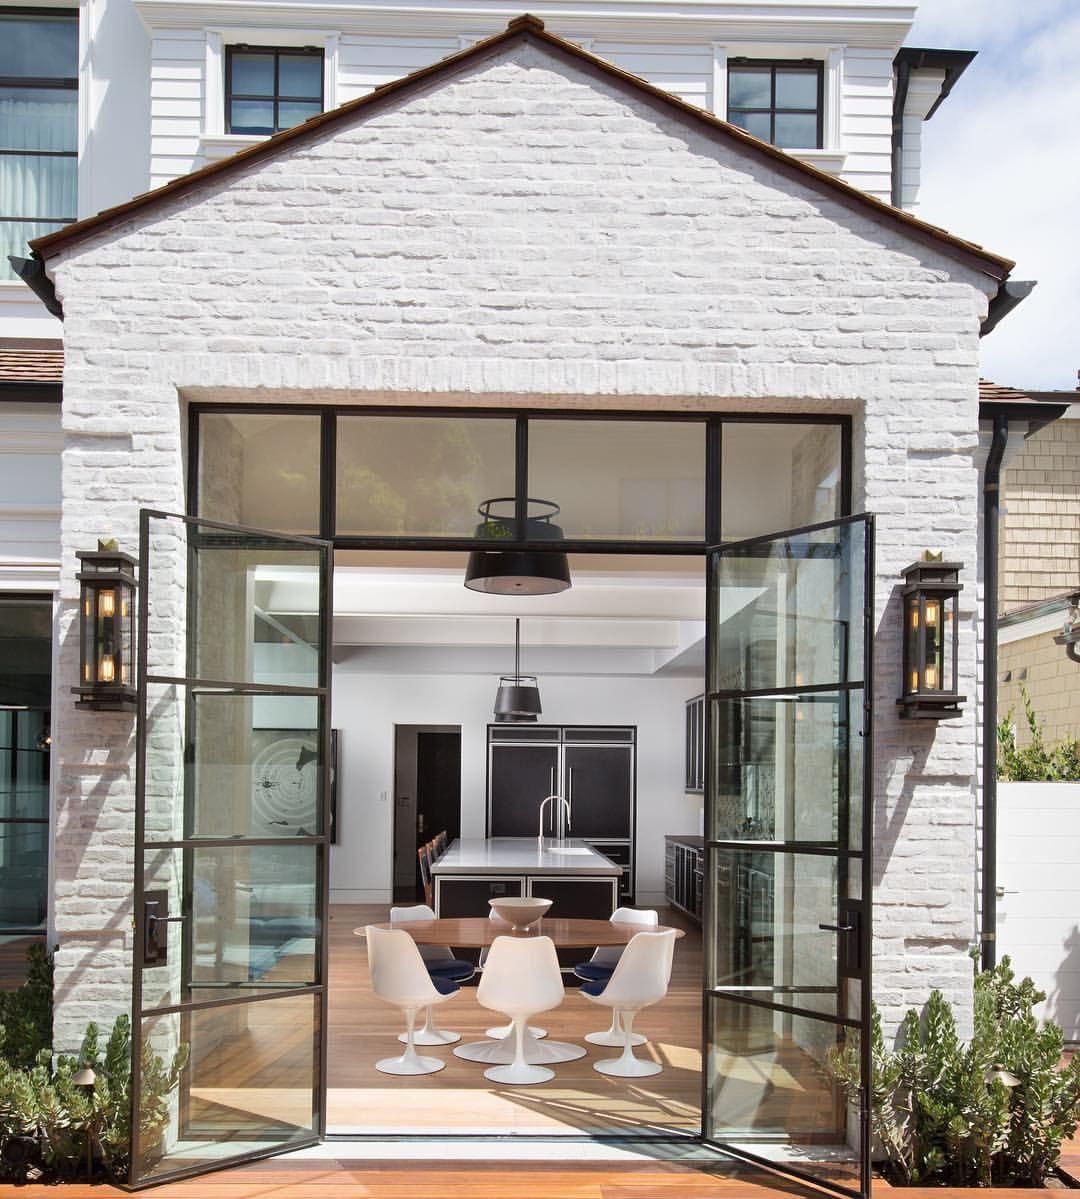 Brick Home Exterior Design Ideas: White Brick Wall Texture Interior Background Design Ideas